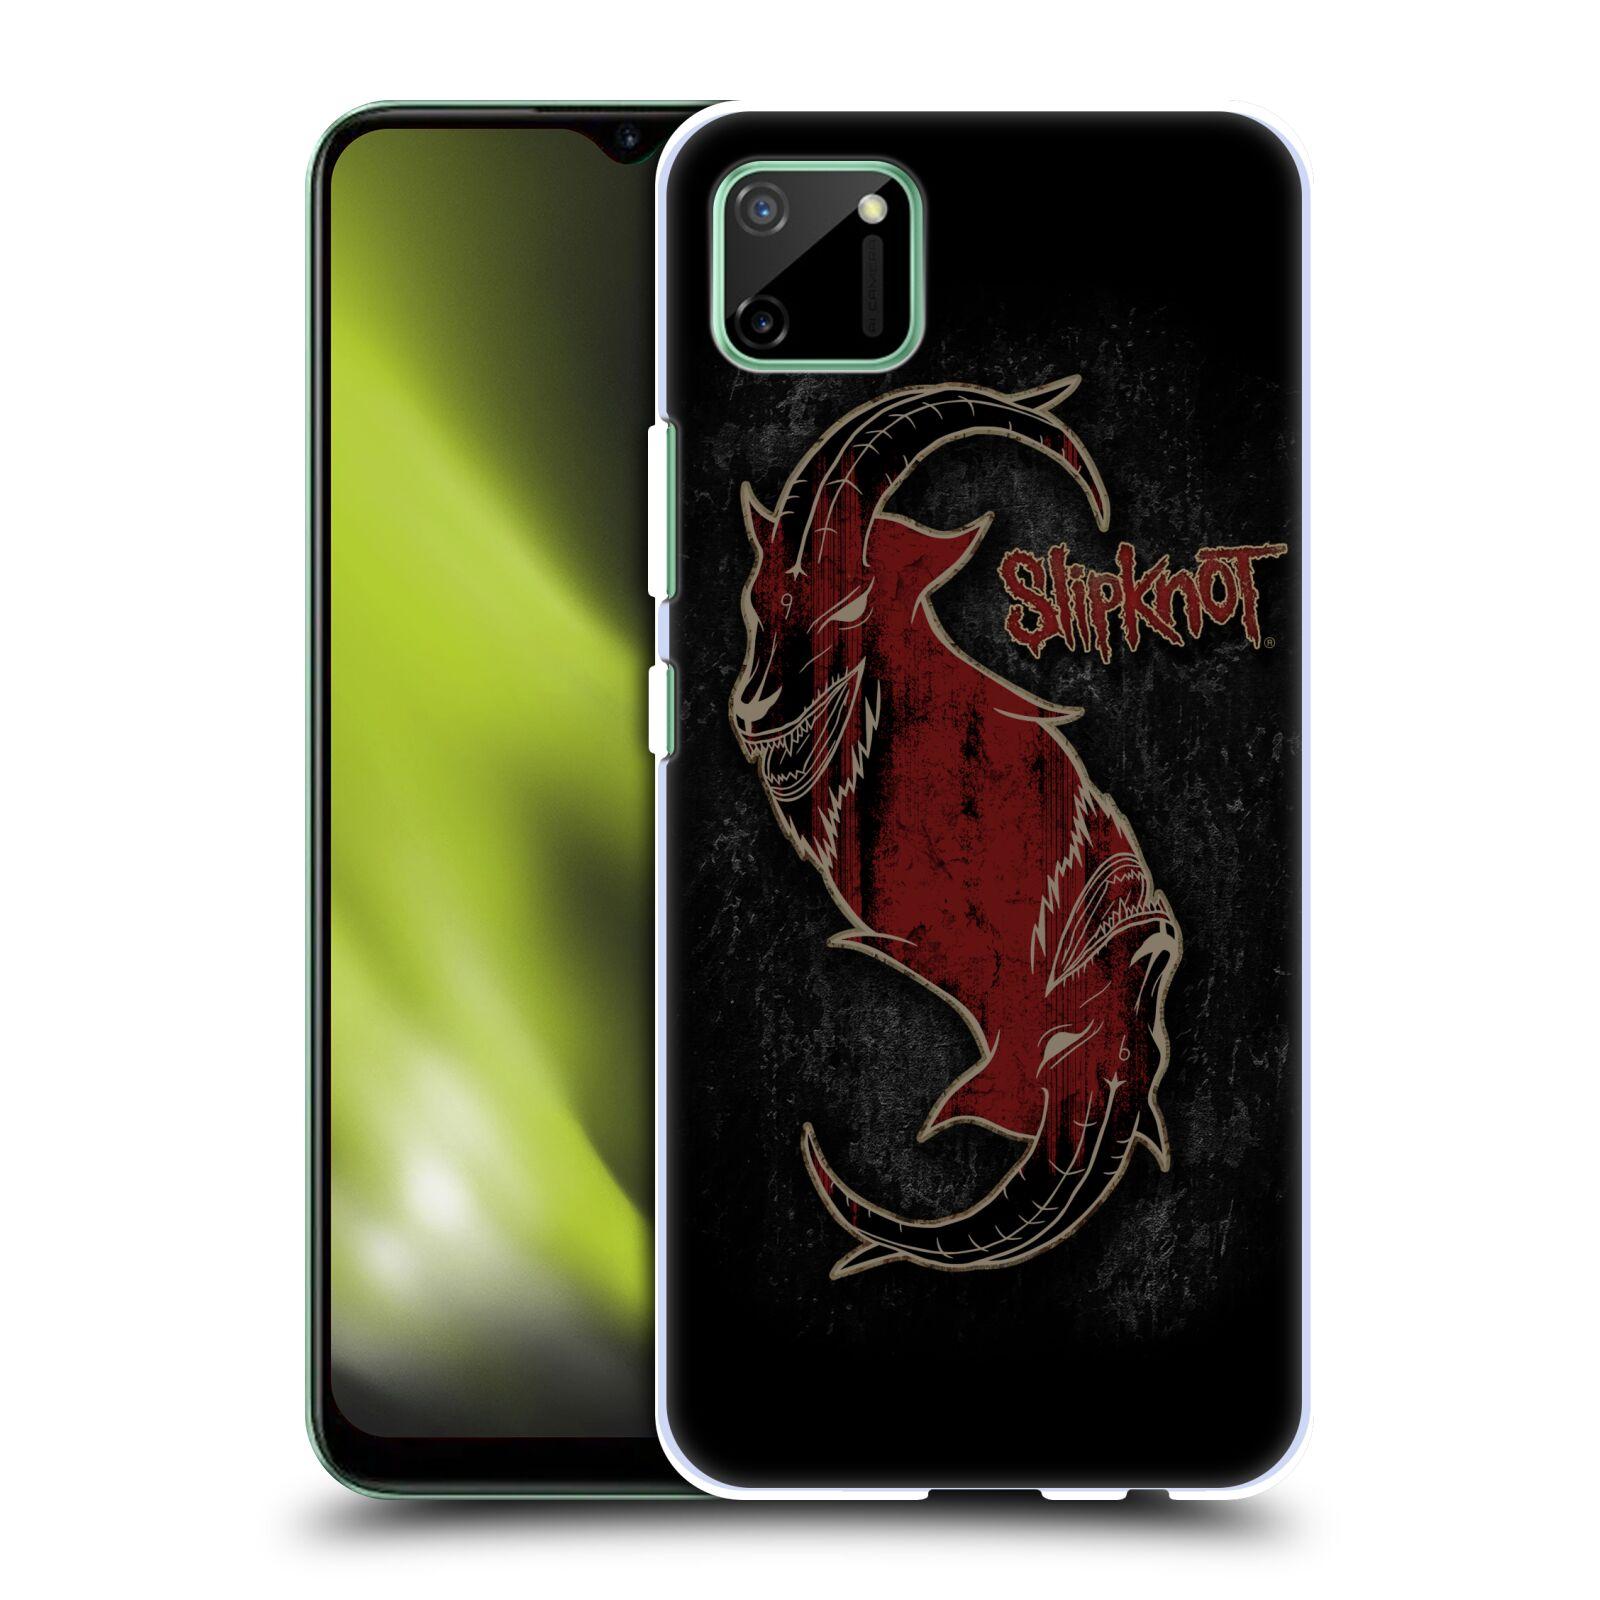 Plastové pouzdro na mobil Realme C11 - Head Case - Slipknot - Rudý kozel